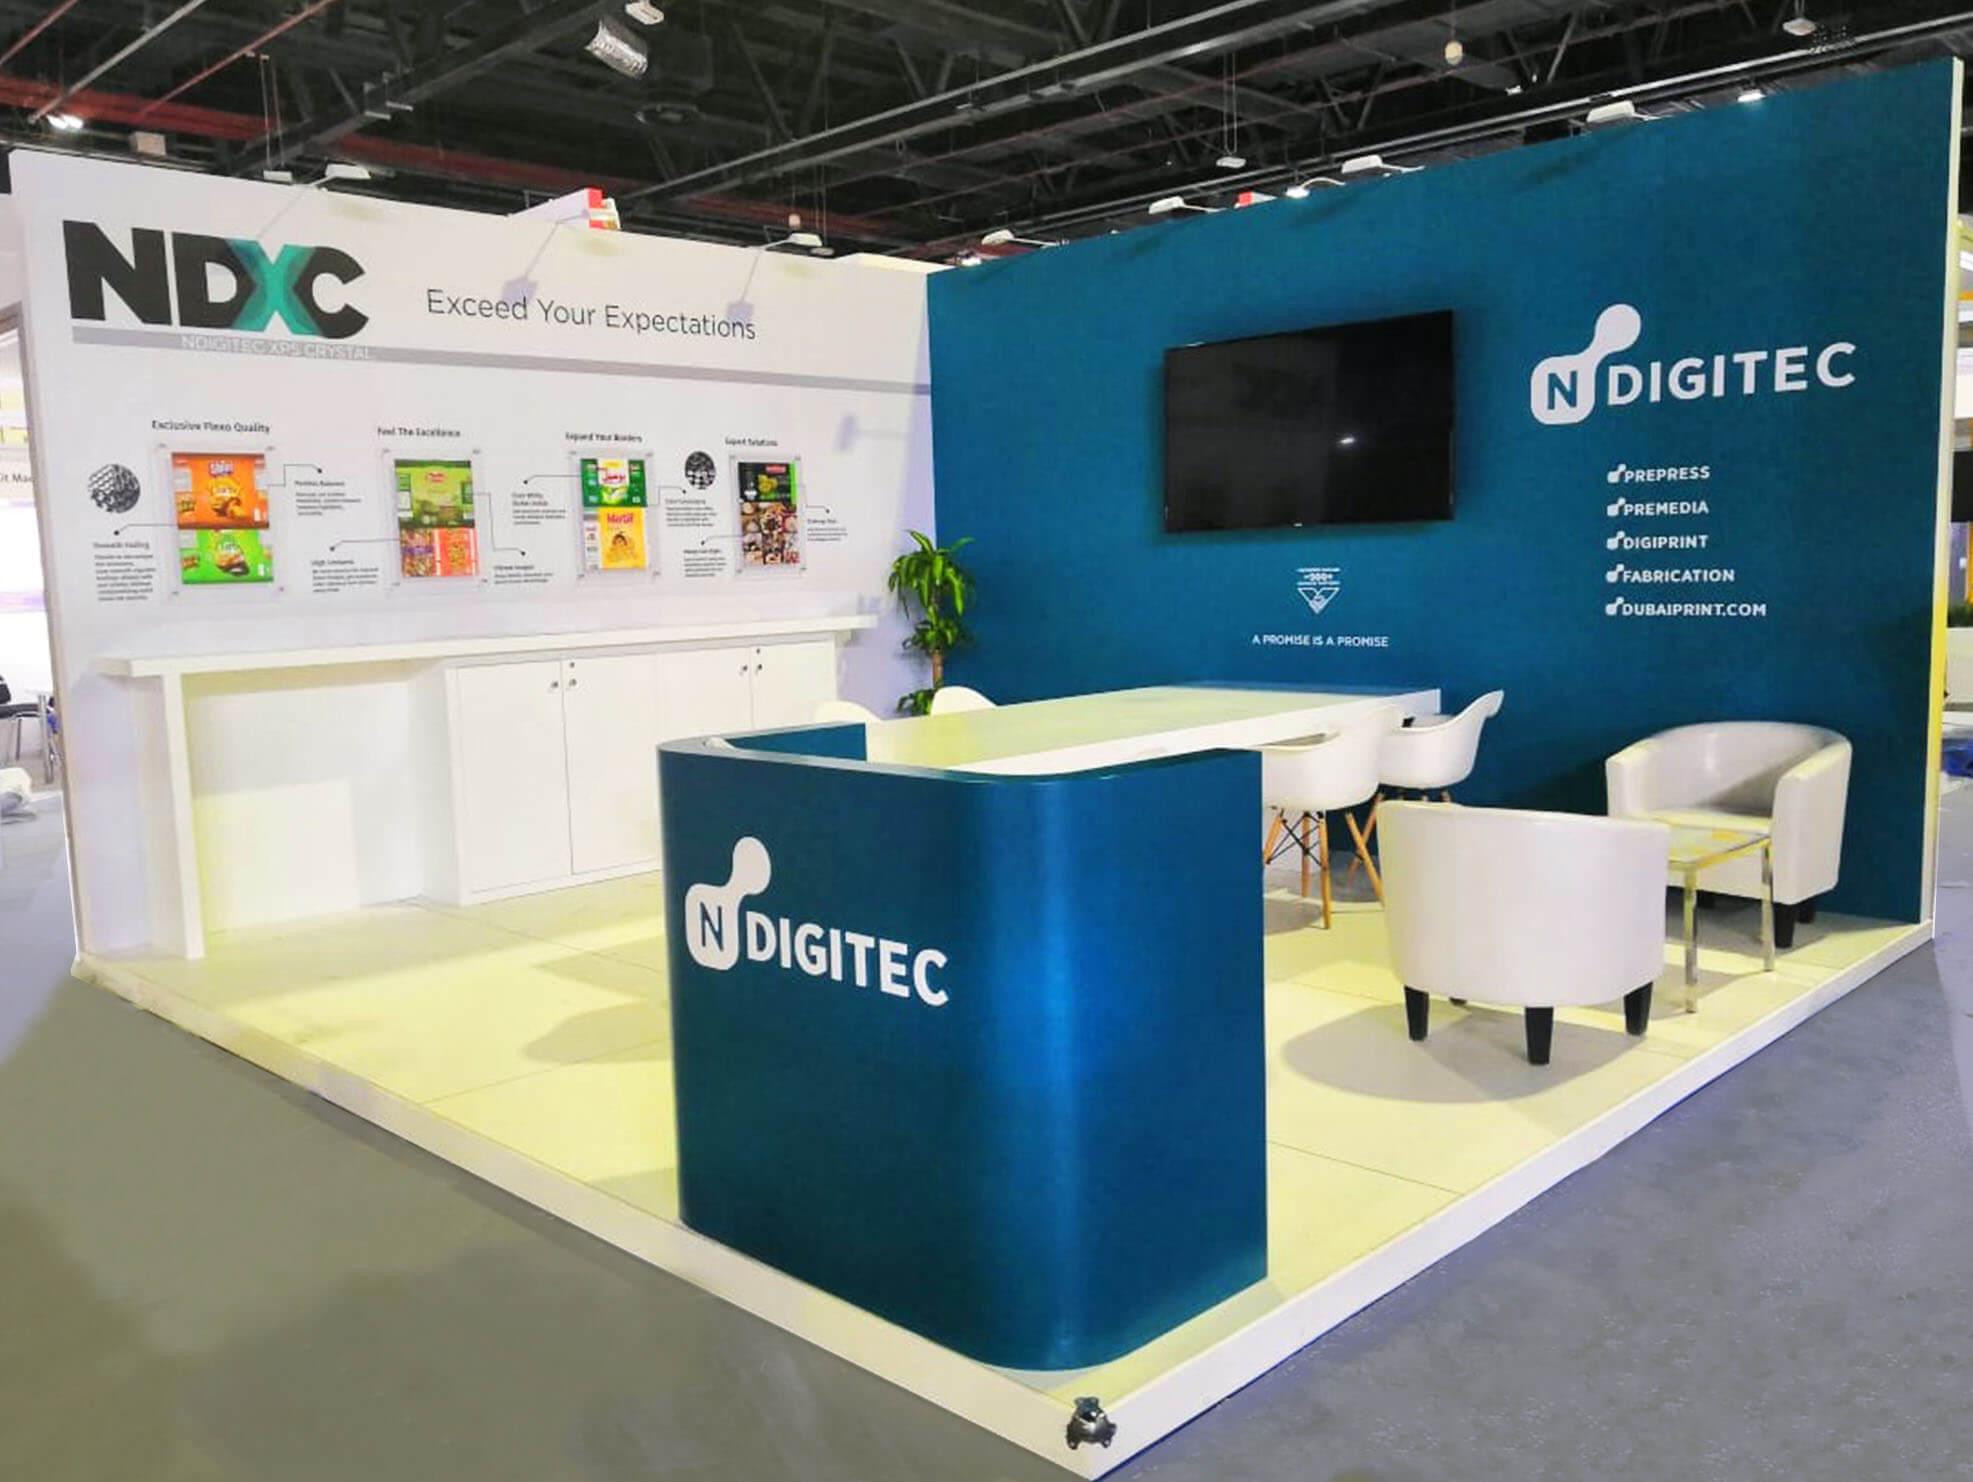 NDigitec's trade show photo booth design